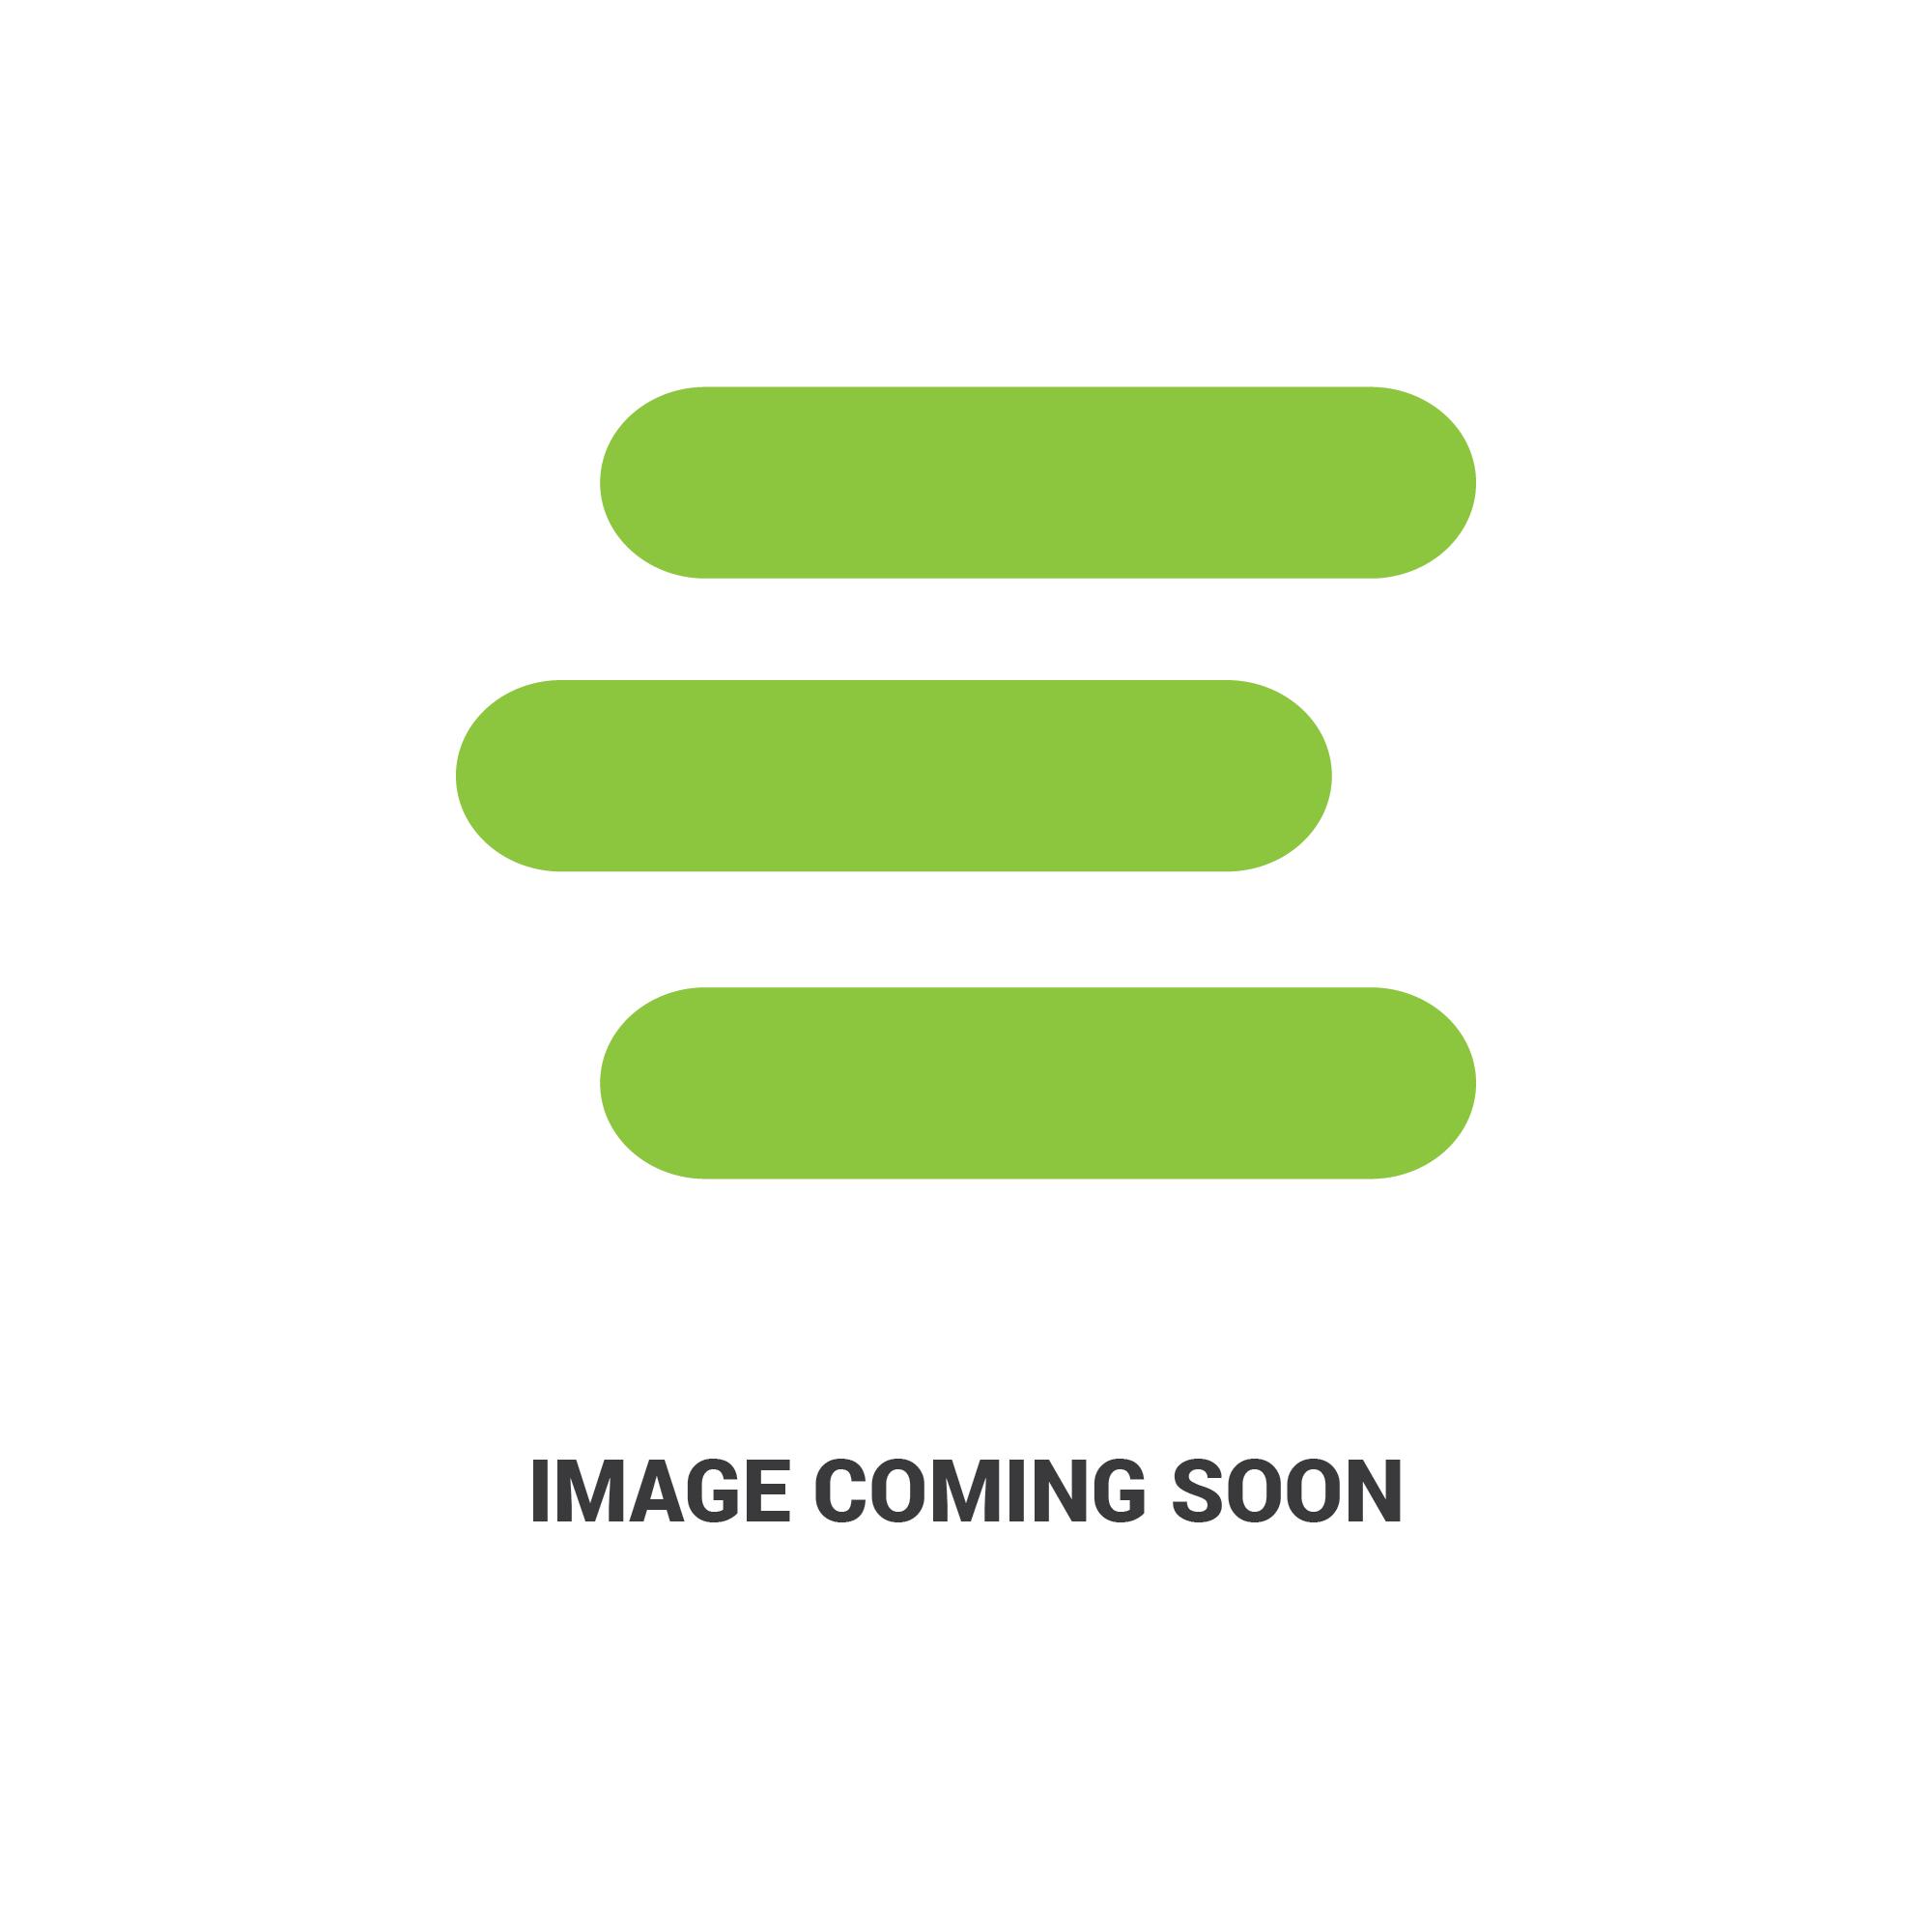 E-71052521153_1.jpg